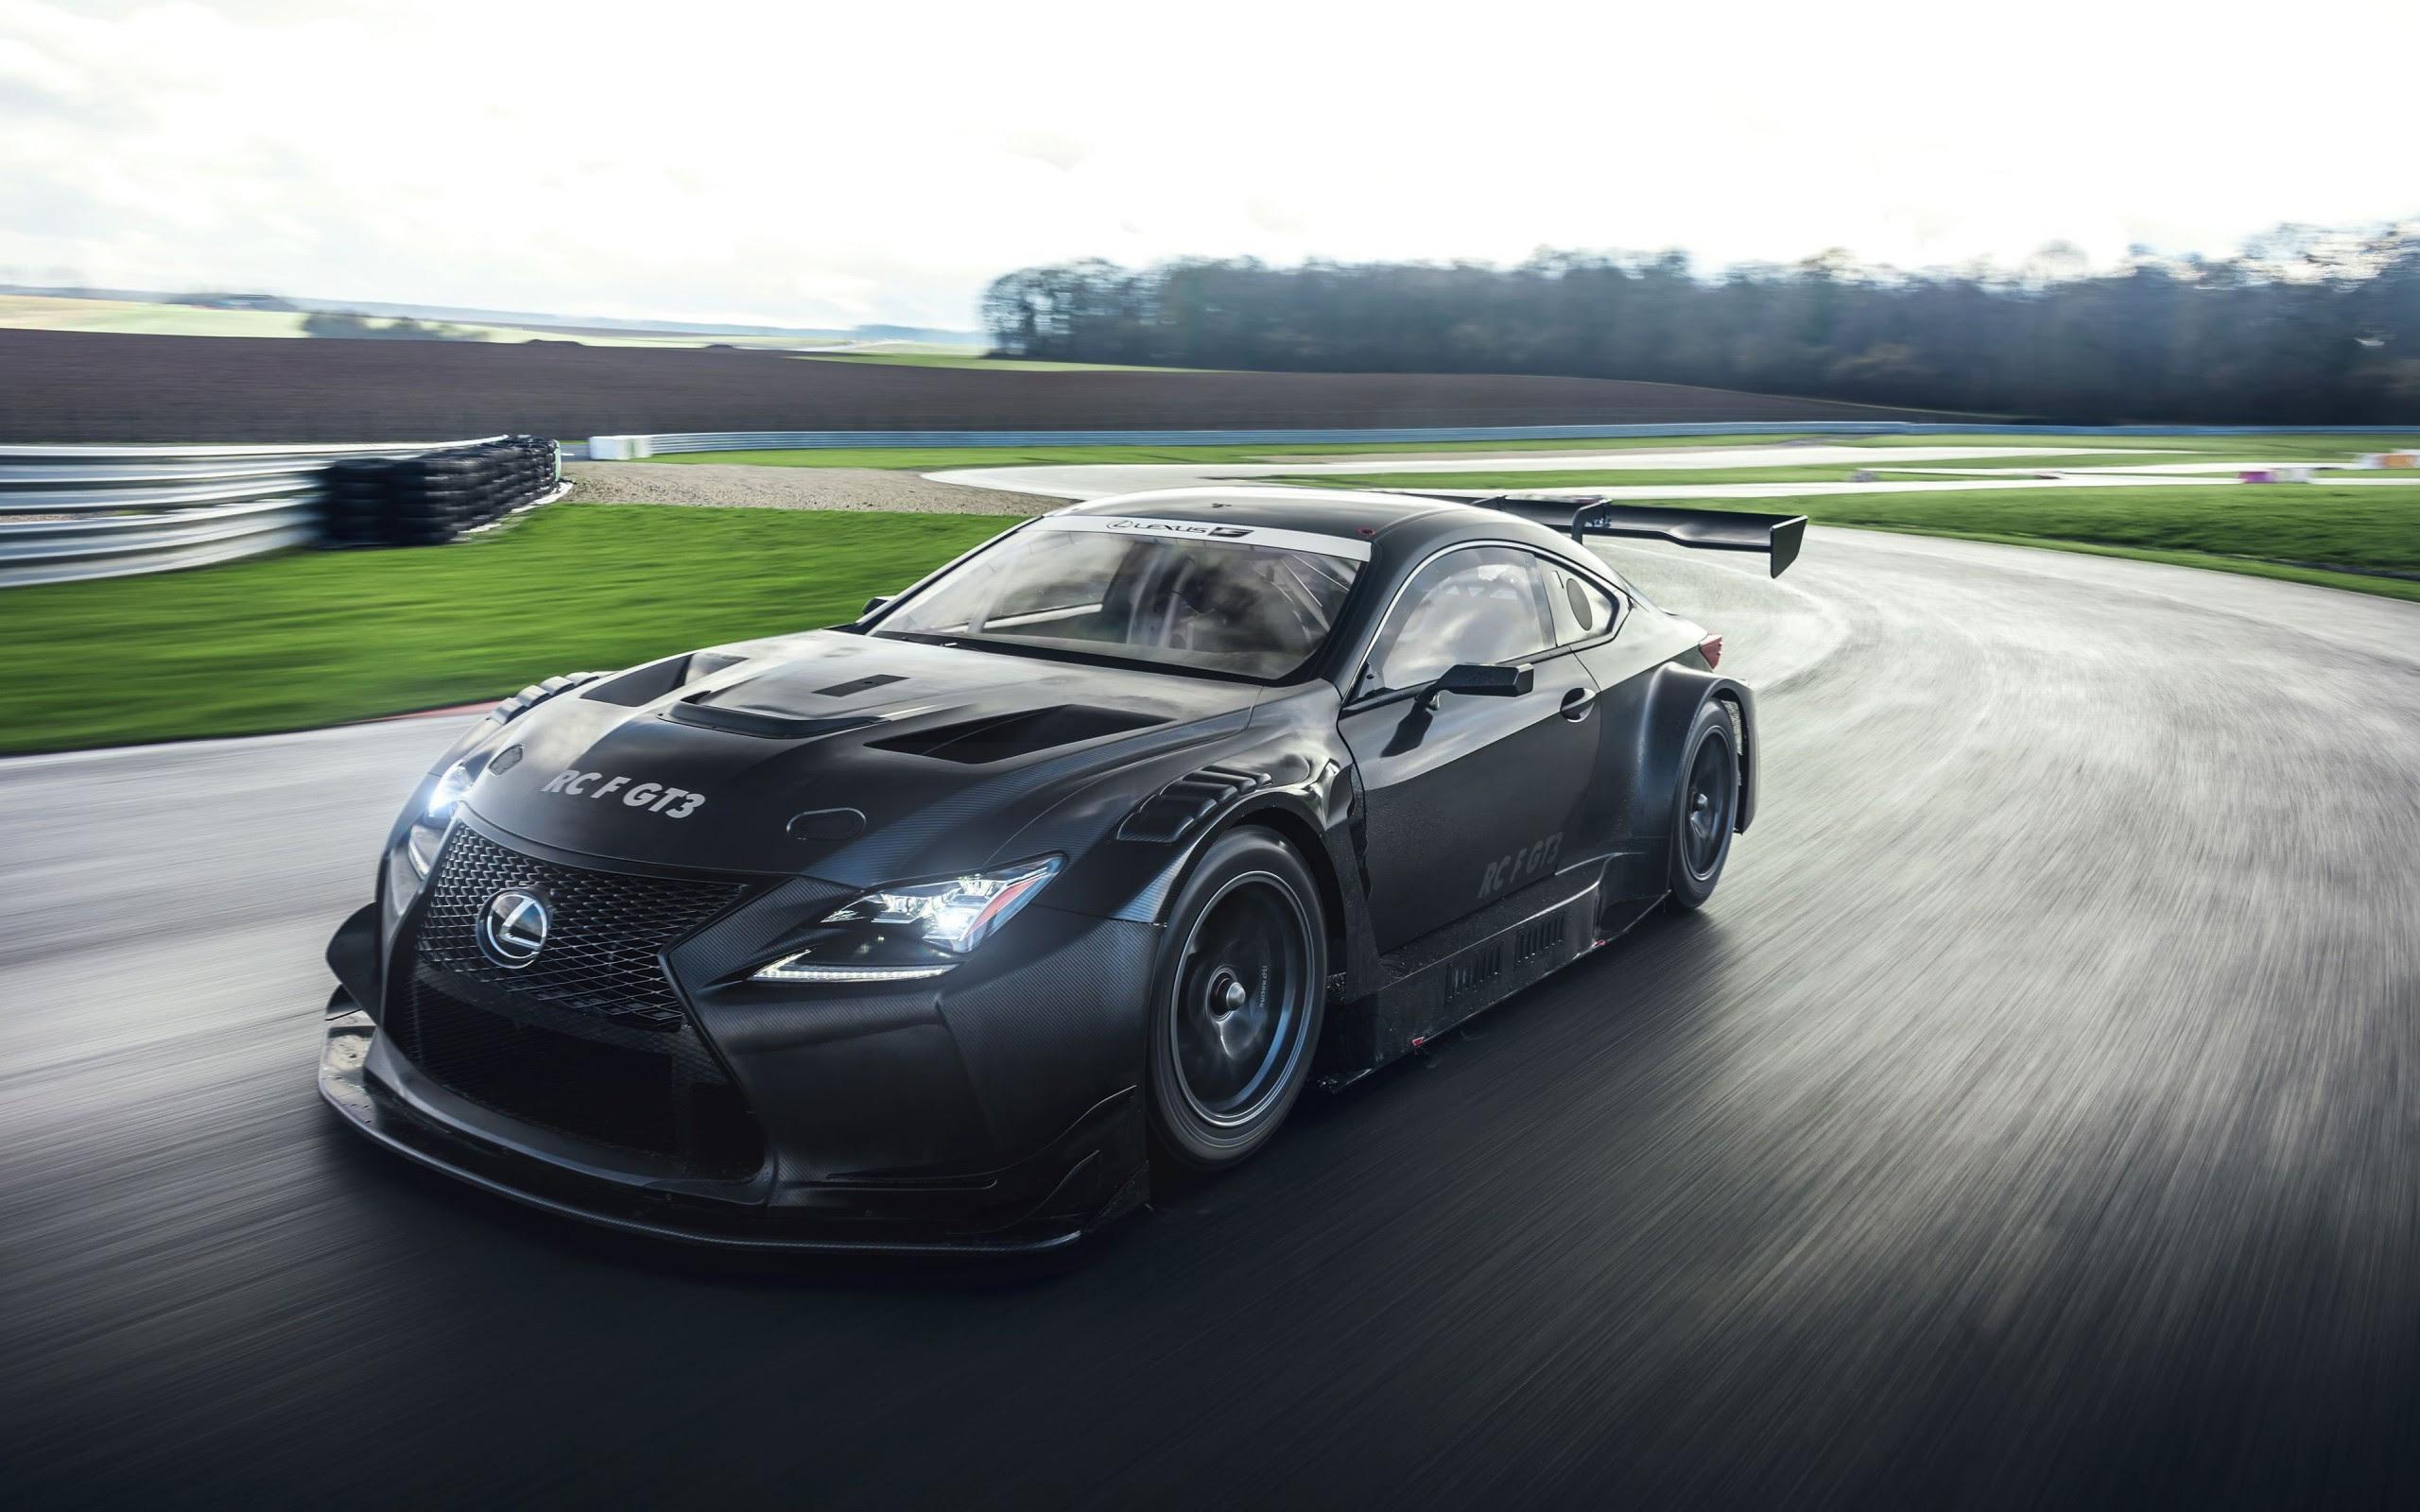 WALLPAPERS HD Lexus RC F GT3